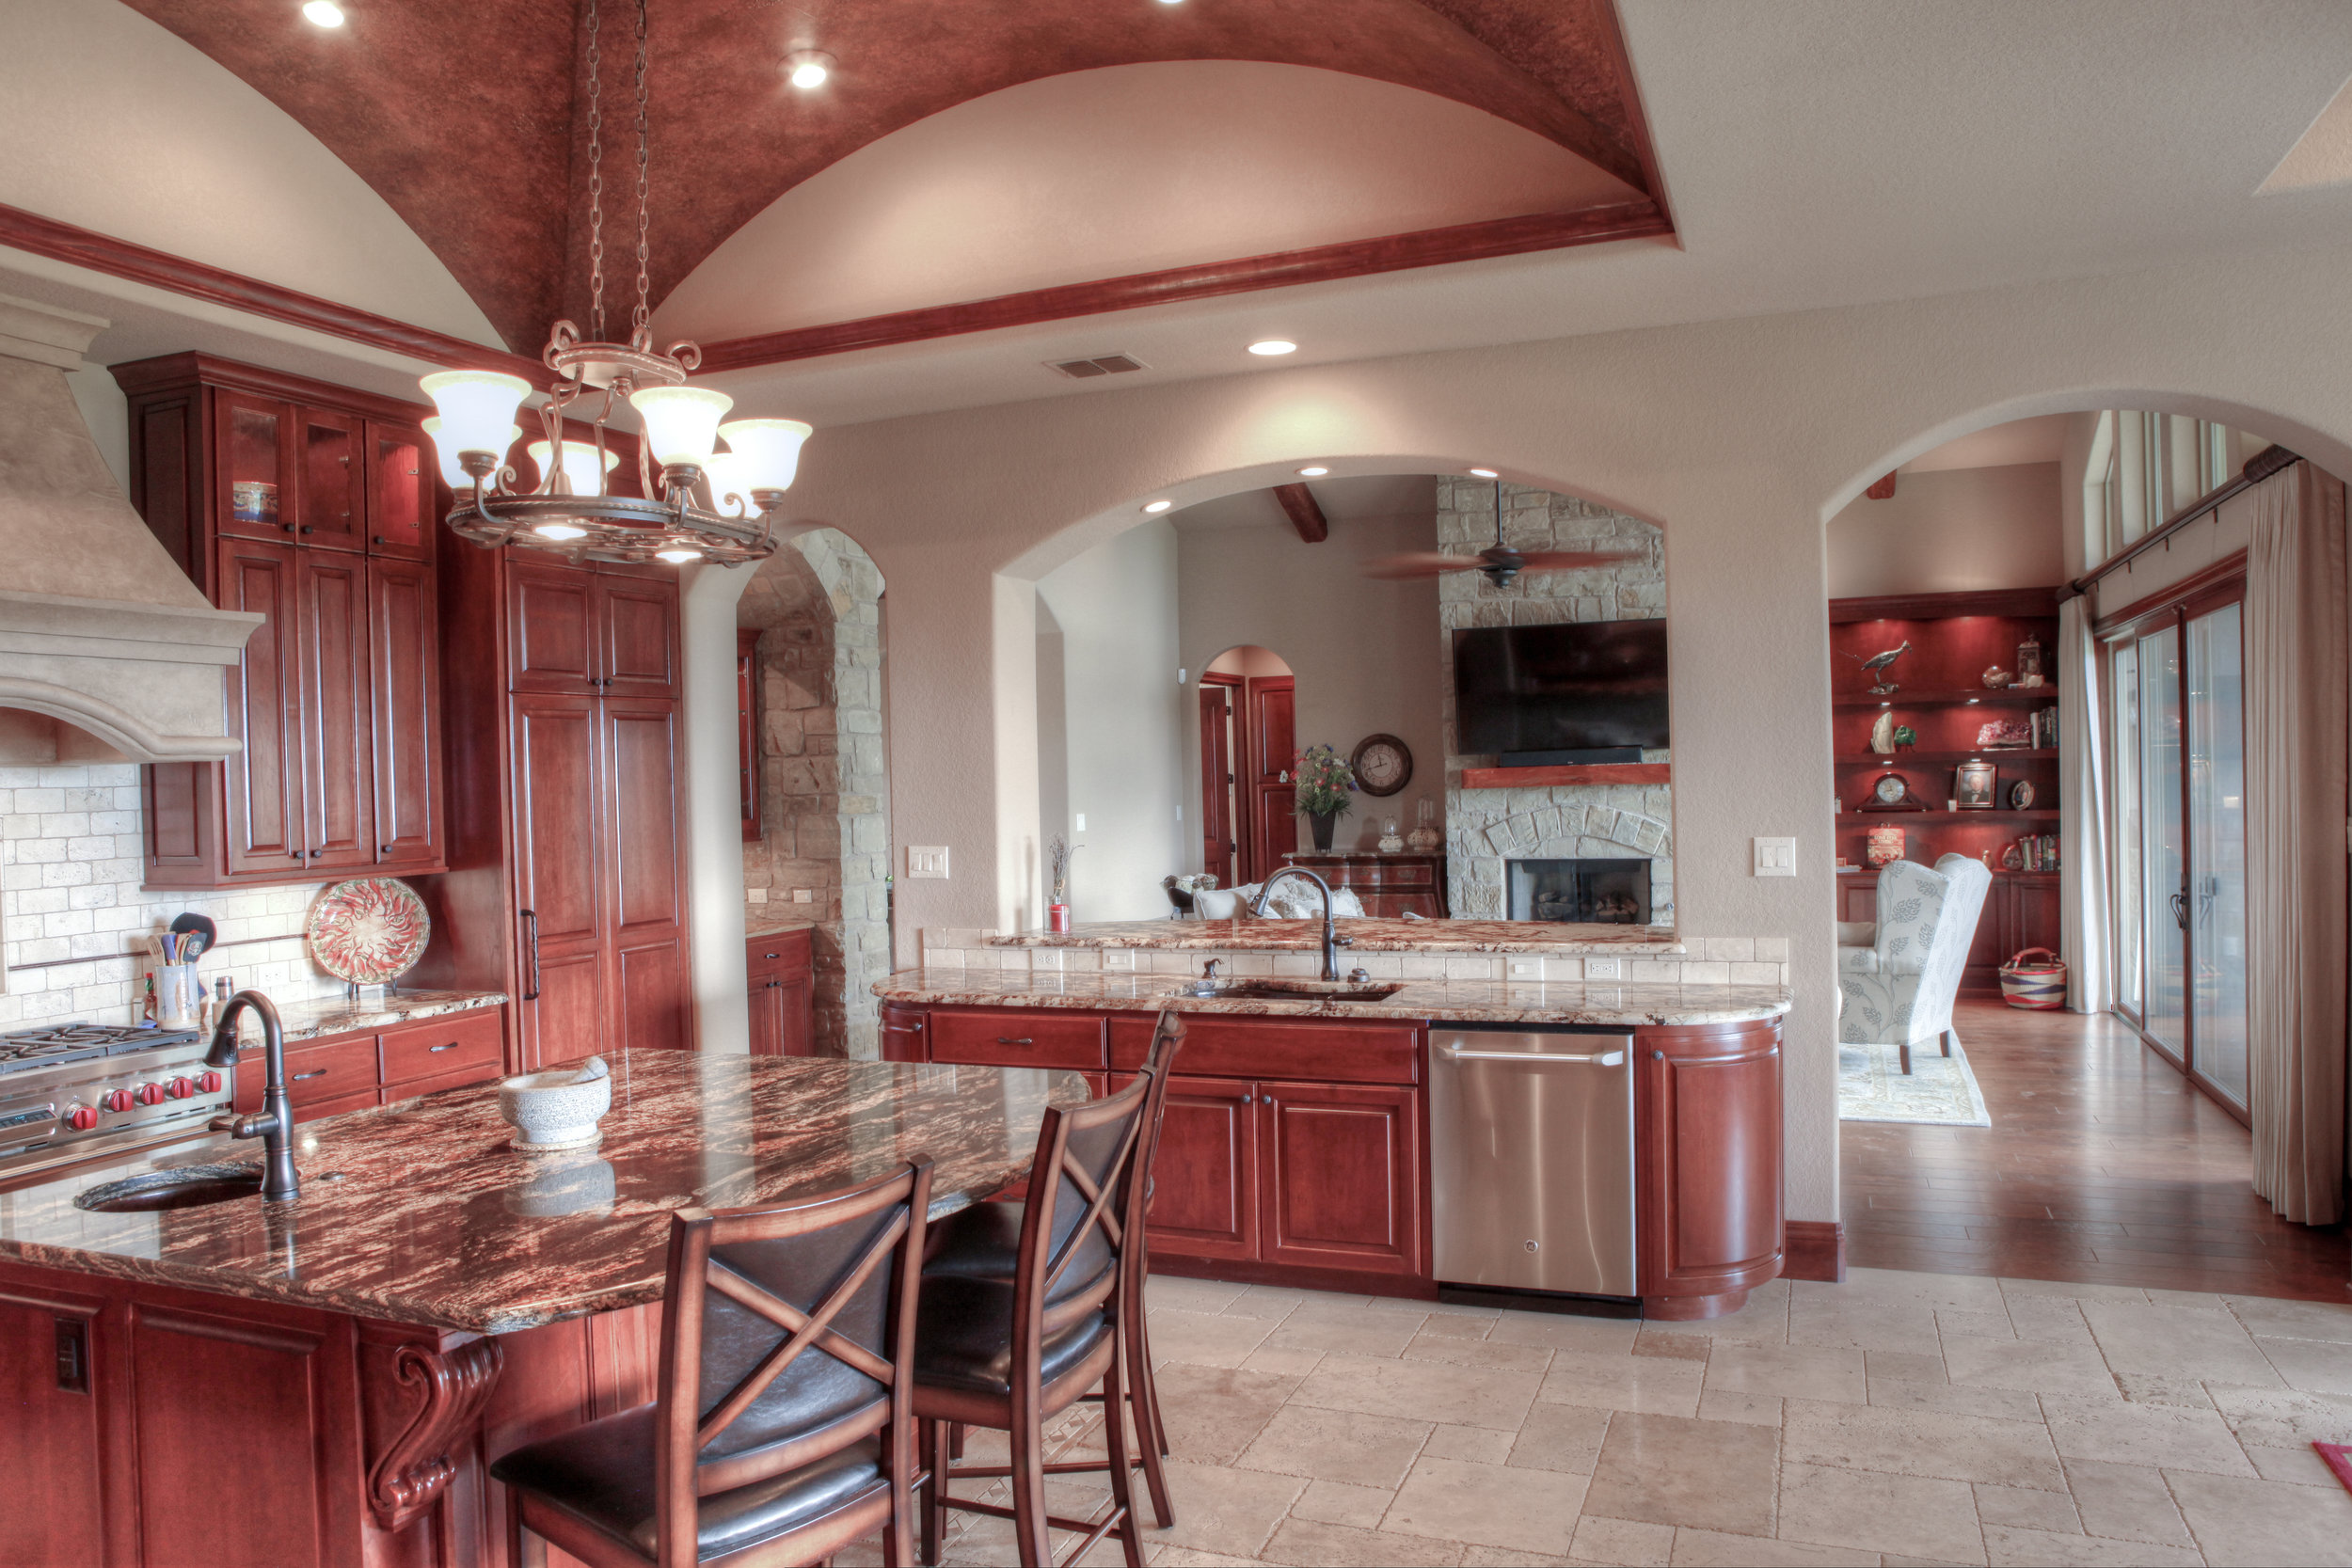 15-kitchen_living 2.jpg